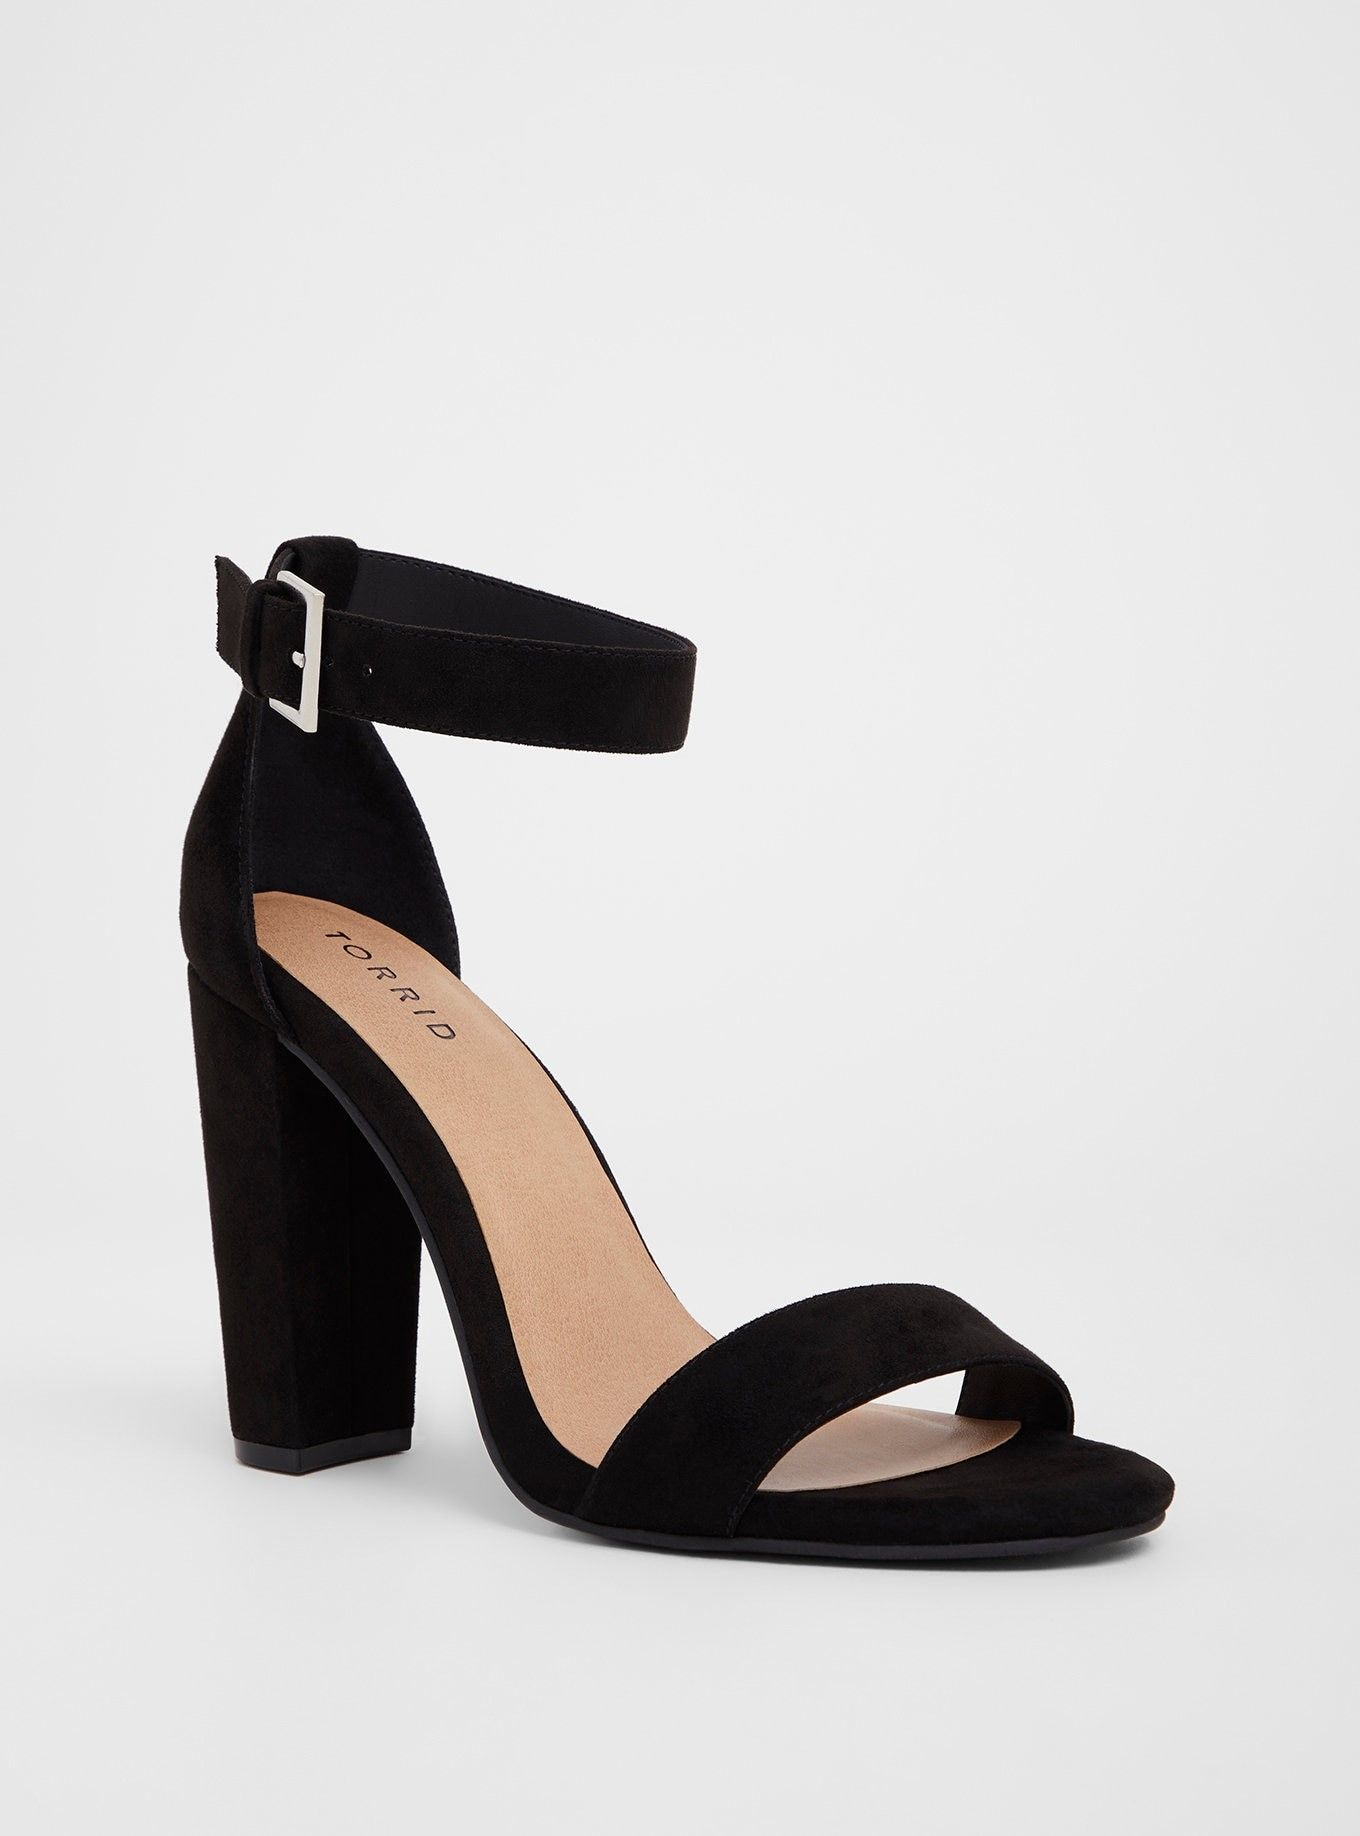 17cbeea7c5 Black Chunky Heel Sandal (Wide Width) - Black faux leather wraps this basic  high